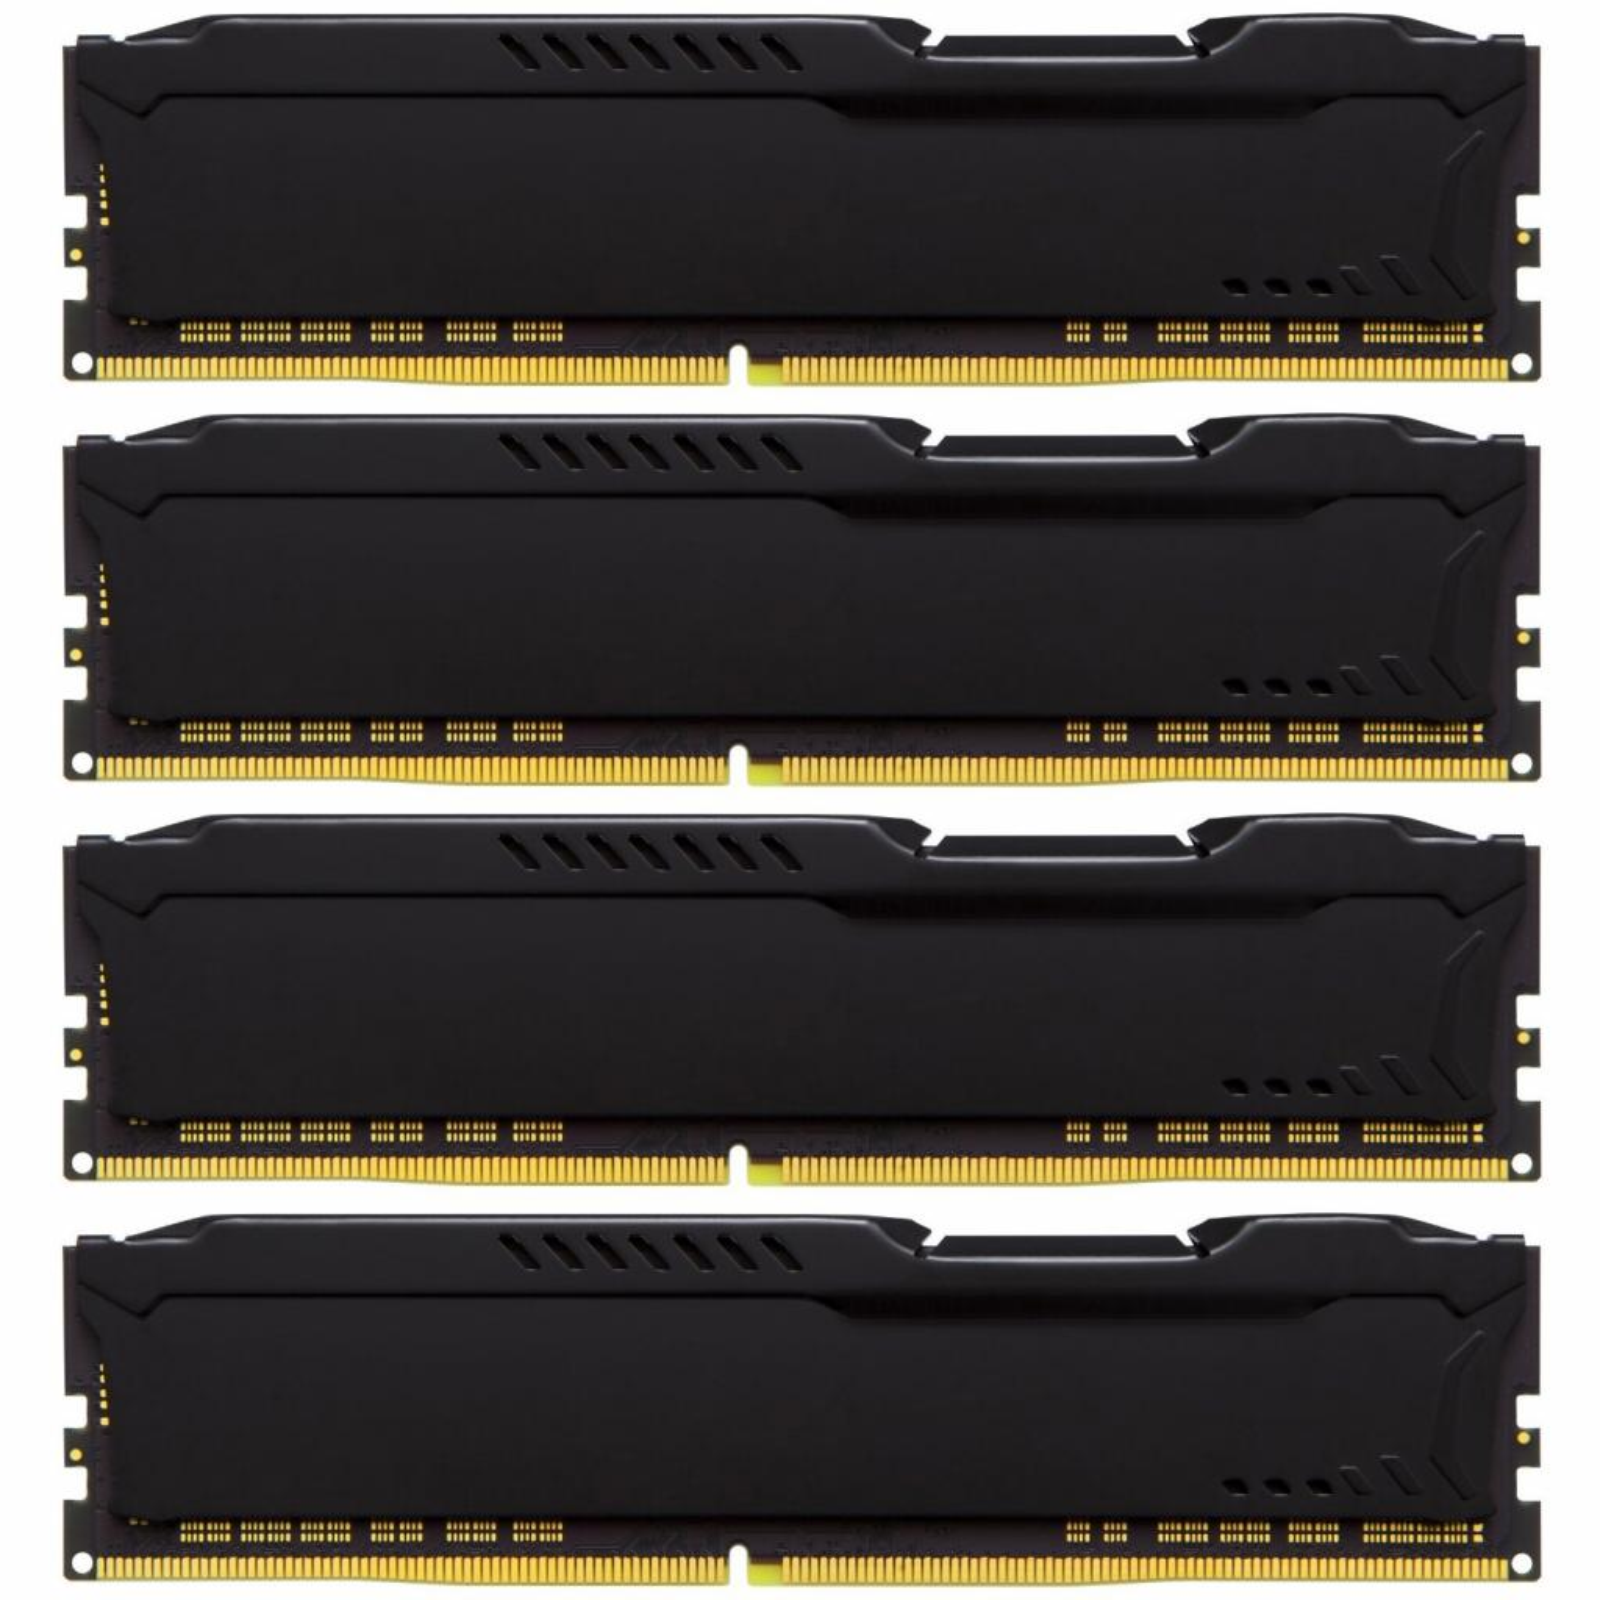 Модуль памяти для компьютера DDR4 32GB (4x8GB) 2400 MHz HyperX FURY Black Kingston (HX424C15FB2K4/32) изображение 3